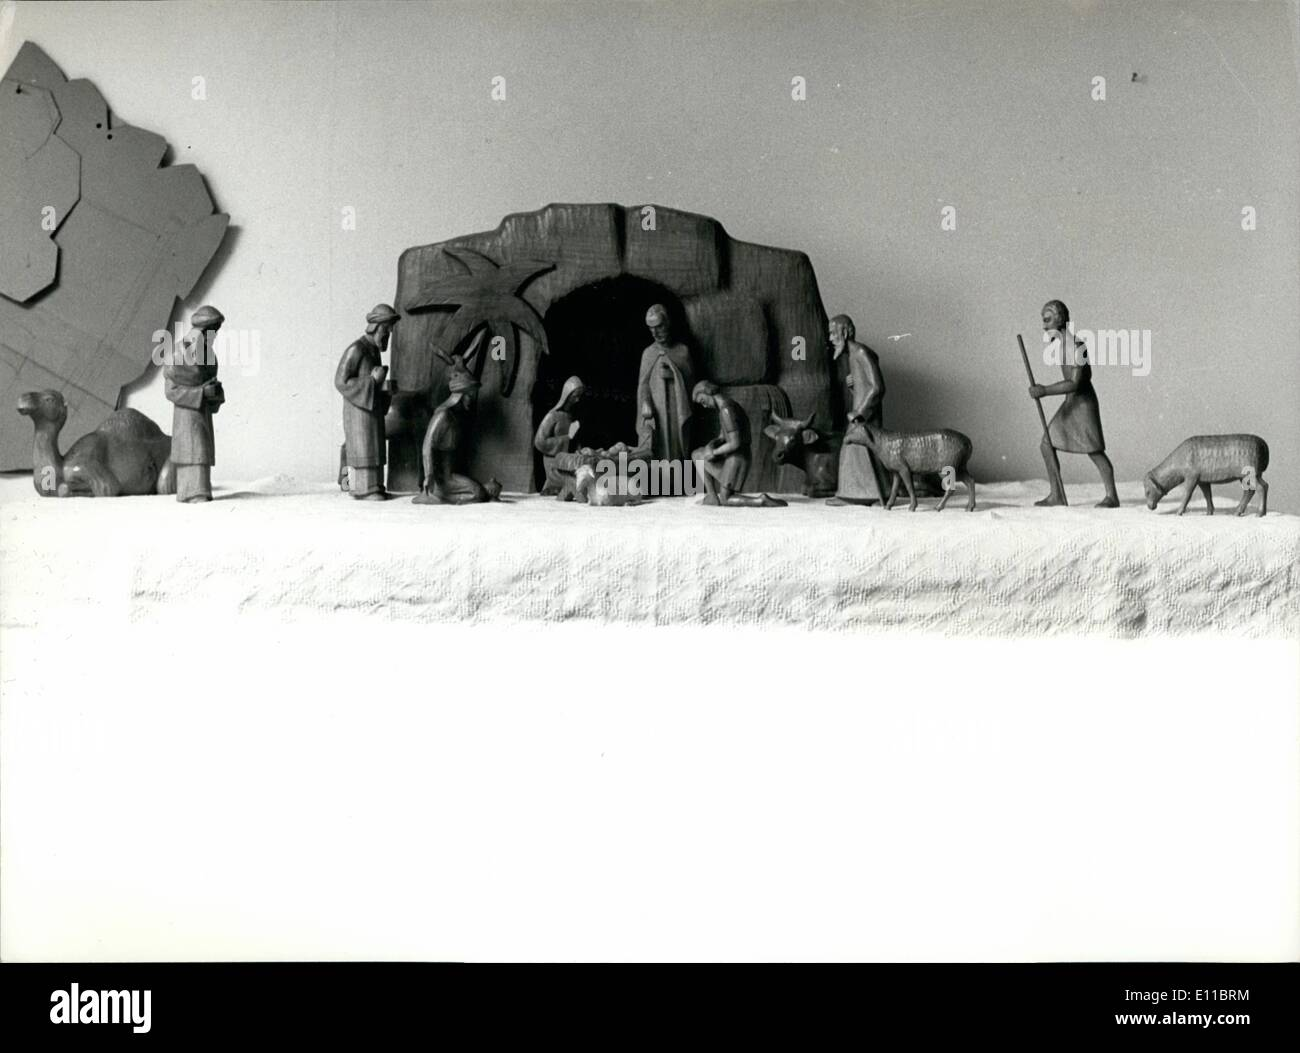 Dec. 12, 1976 - Wooden nativity figurines; Photo Shows One of nativity figurines made by Swiss wood carver Fritz Kehrli. - Stock Image